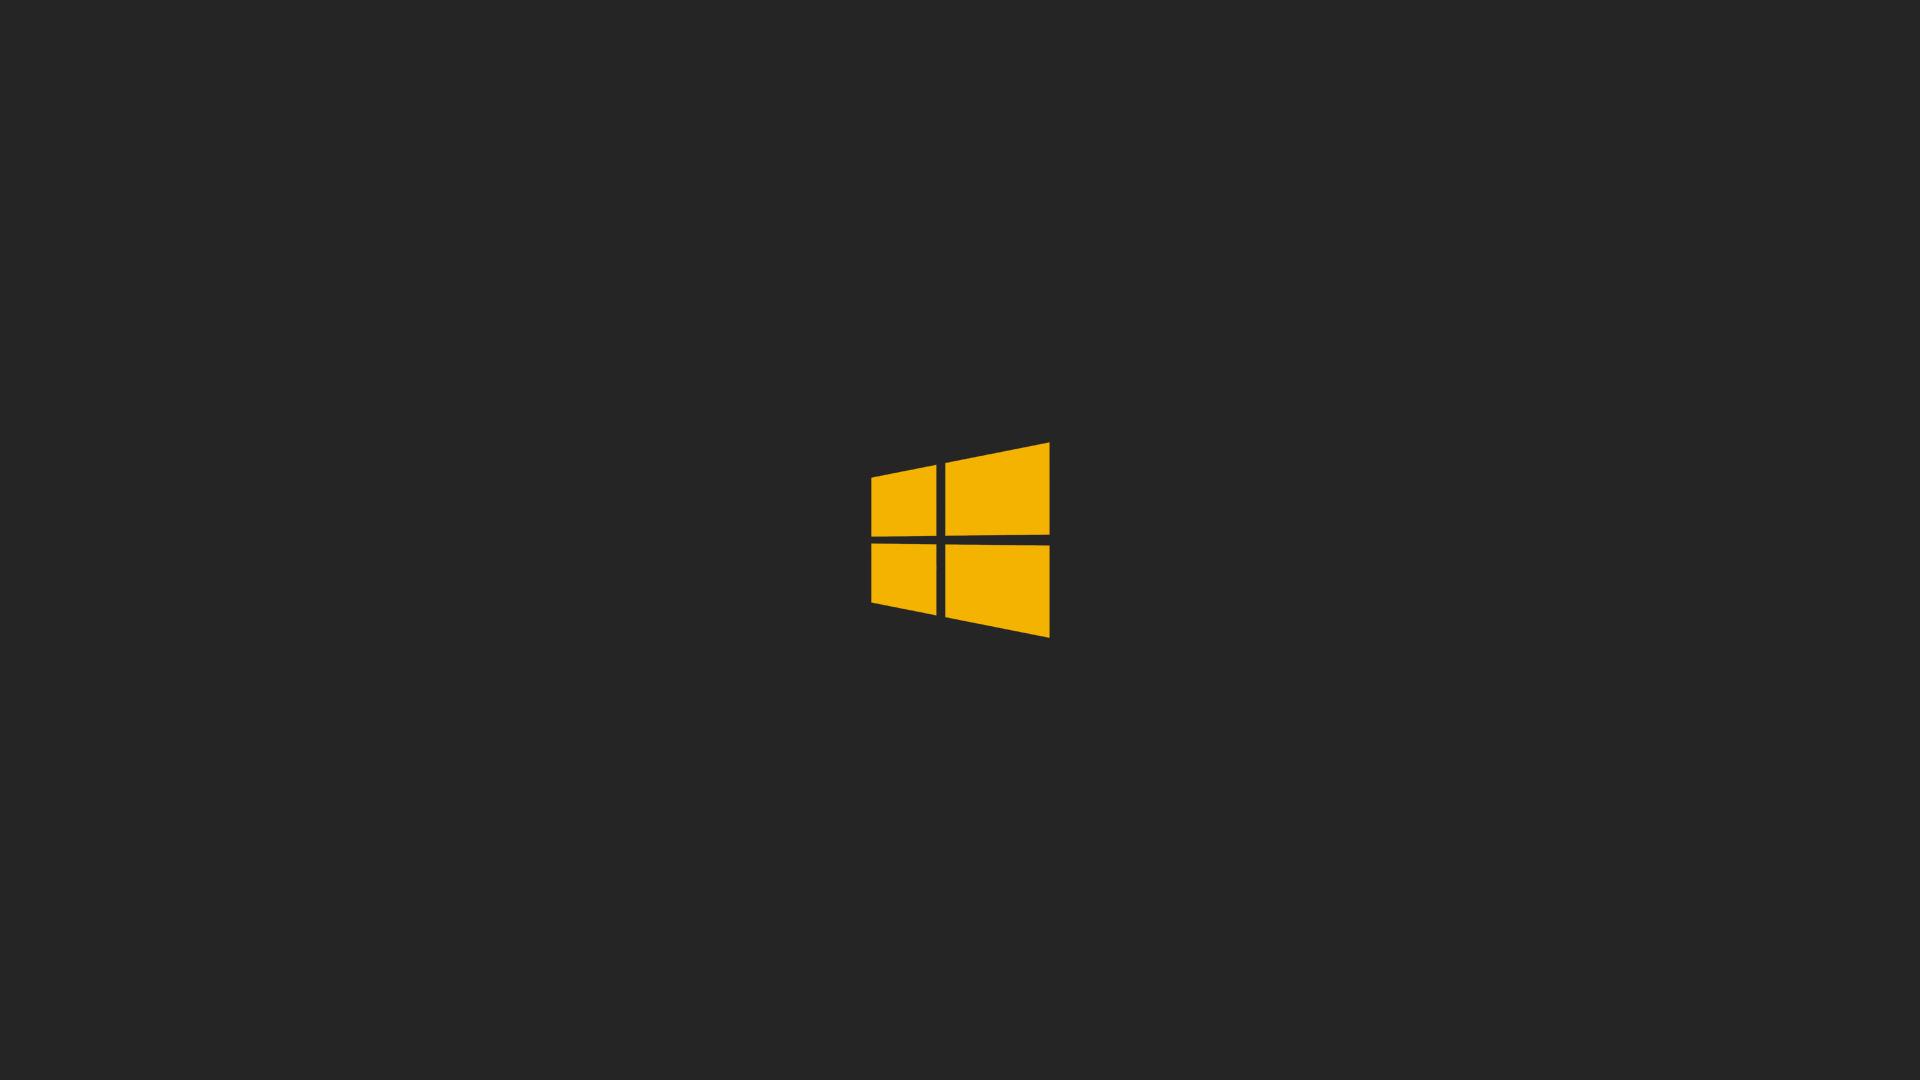 Microsoft Windows 8 Backgound Wallpapers Yellow